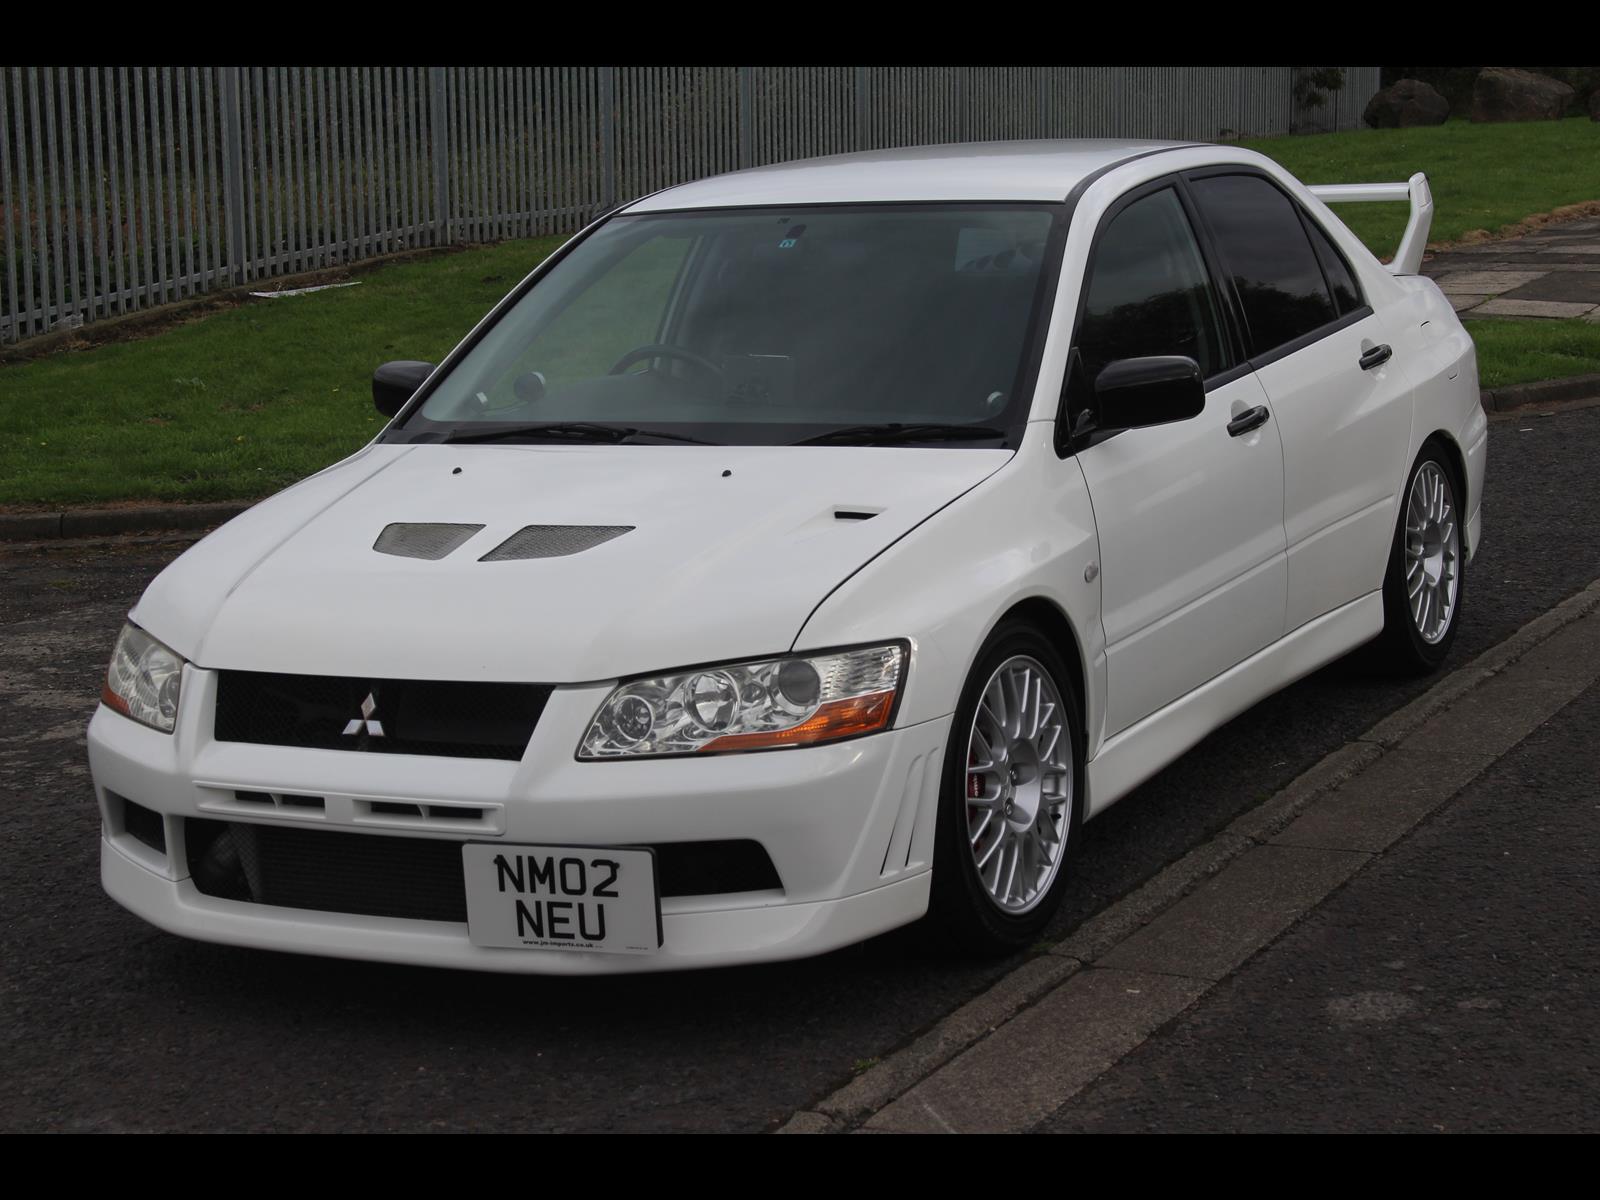 1999 Nissan Skyline Gtr R34 For Sale >> 2002 Mitsubishi Lancer Evo 7 RS – Rare - JM-Imports